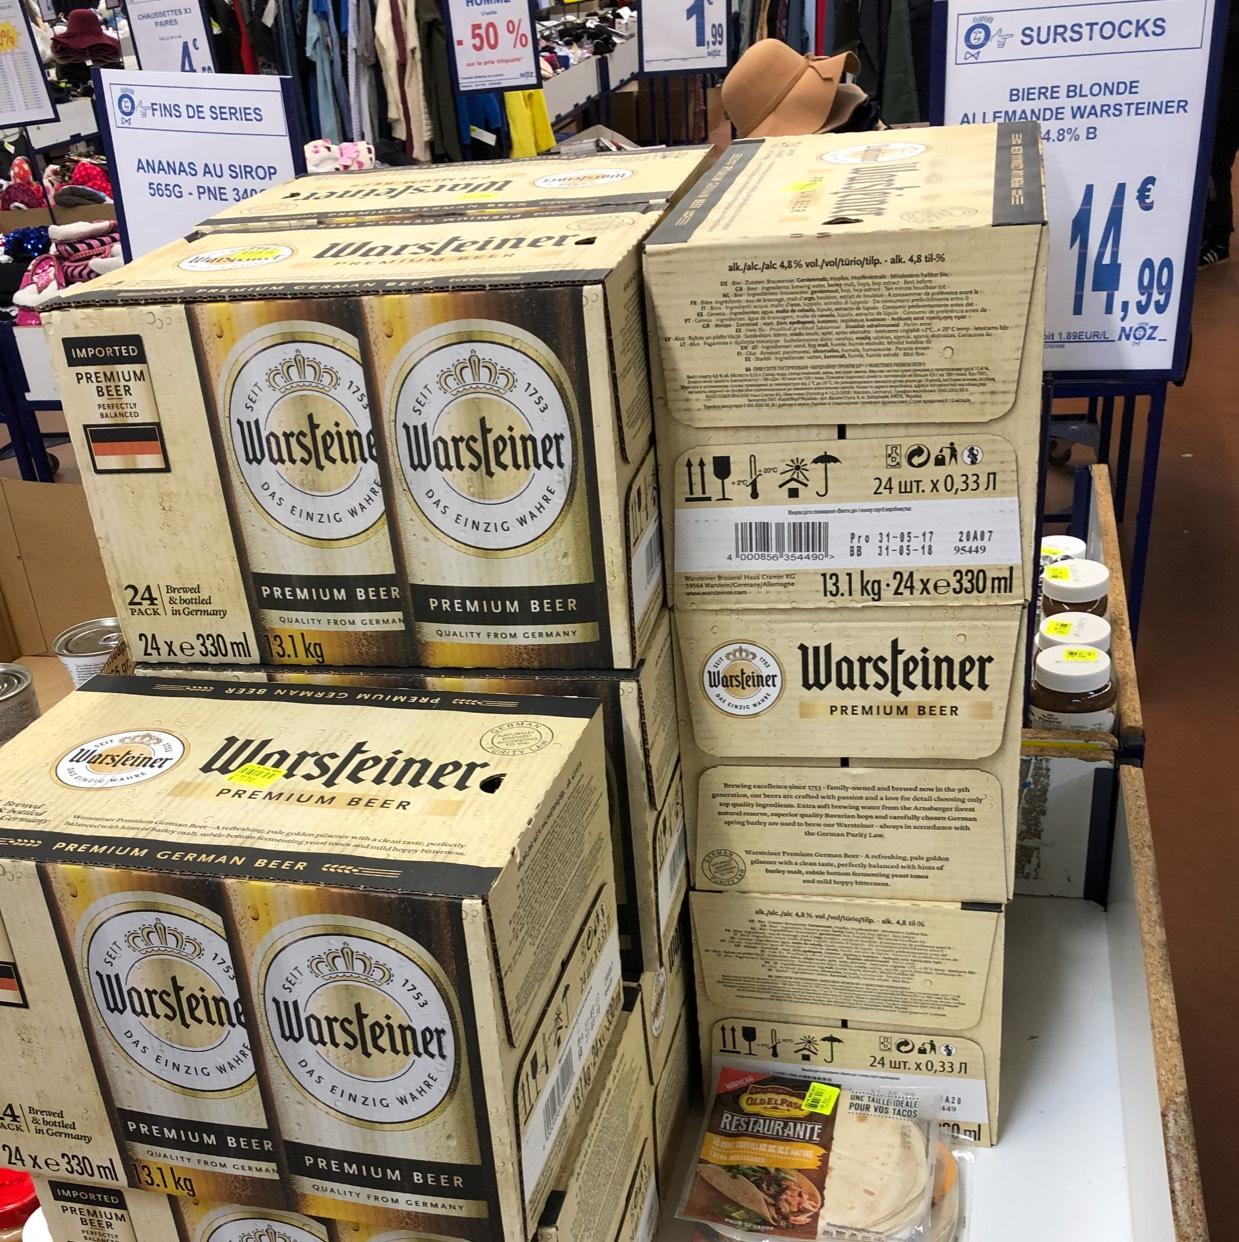 Pack de 24 Bières Warsteiner DLC courte - Noz Joigny (89)